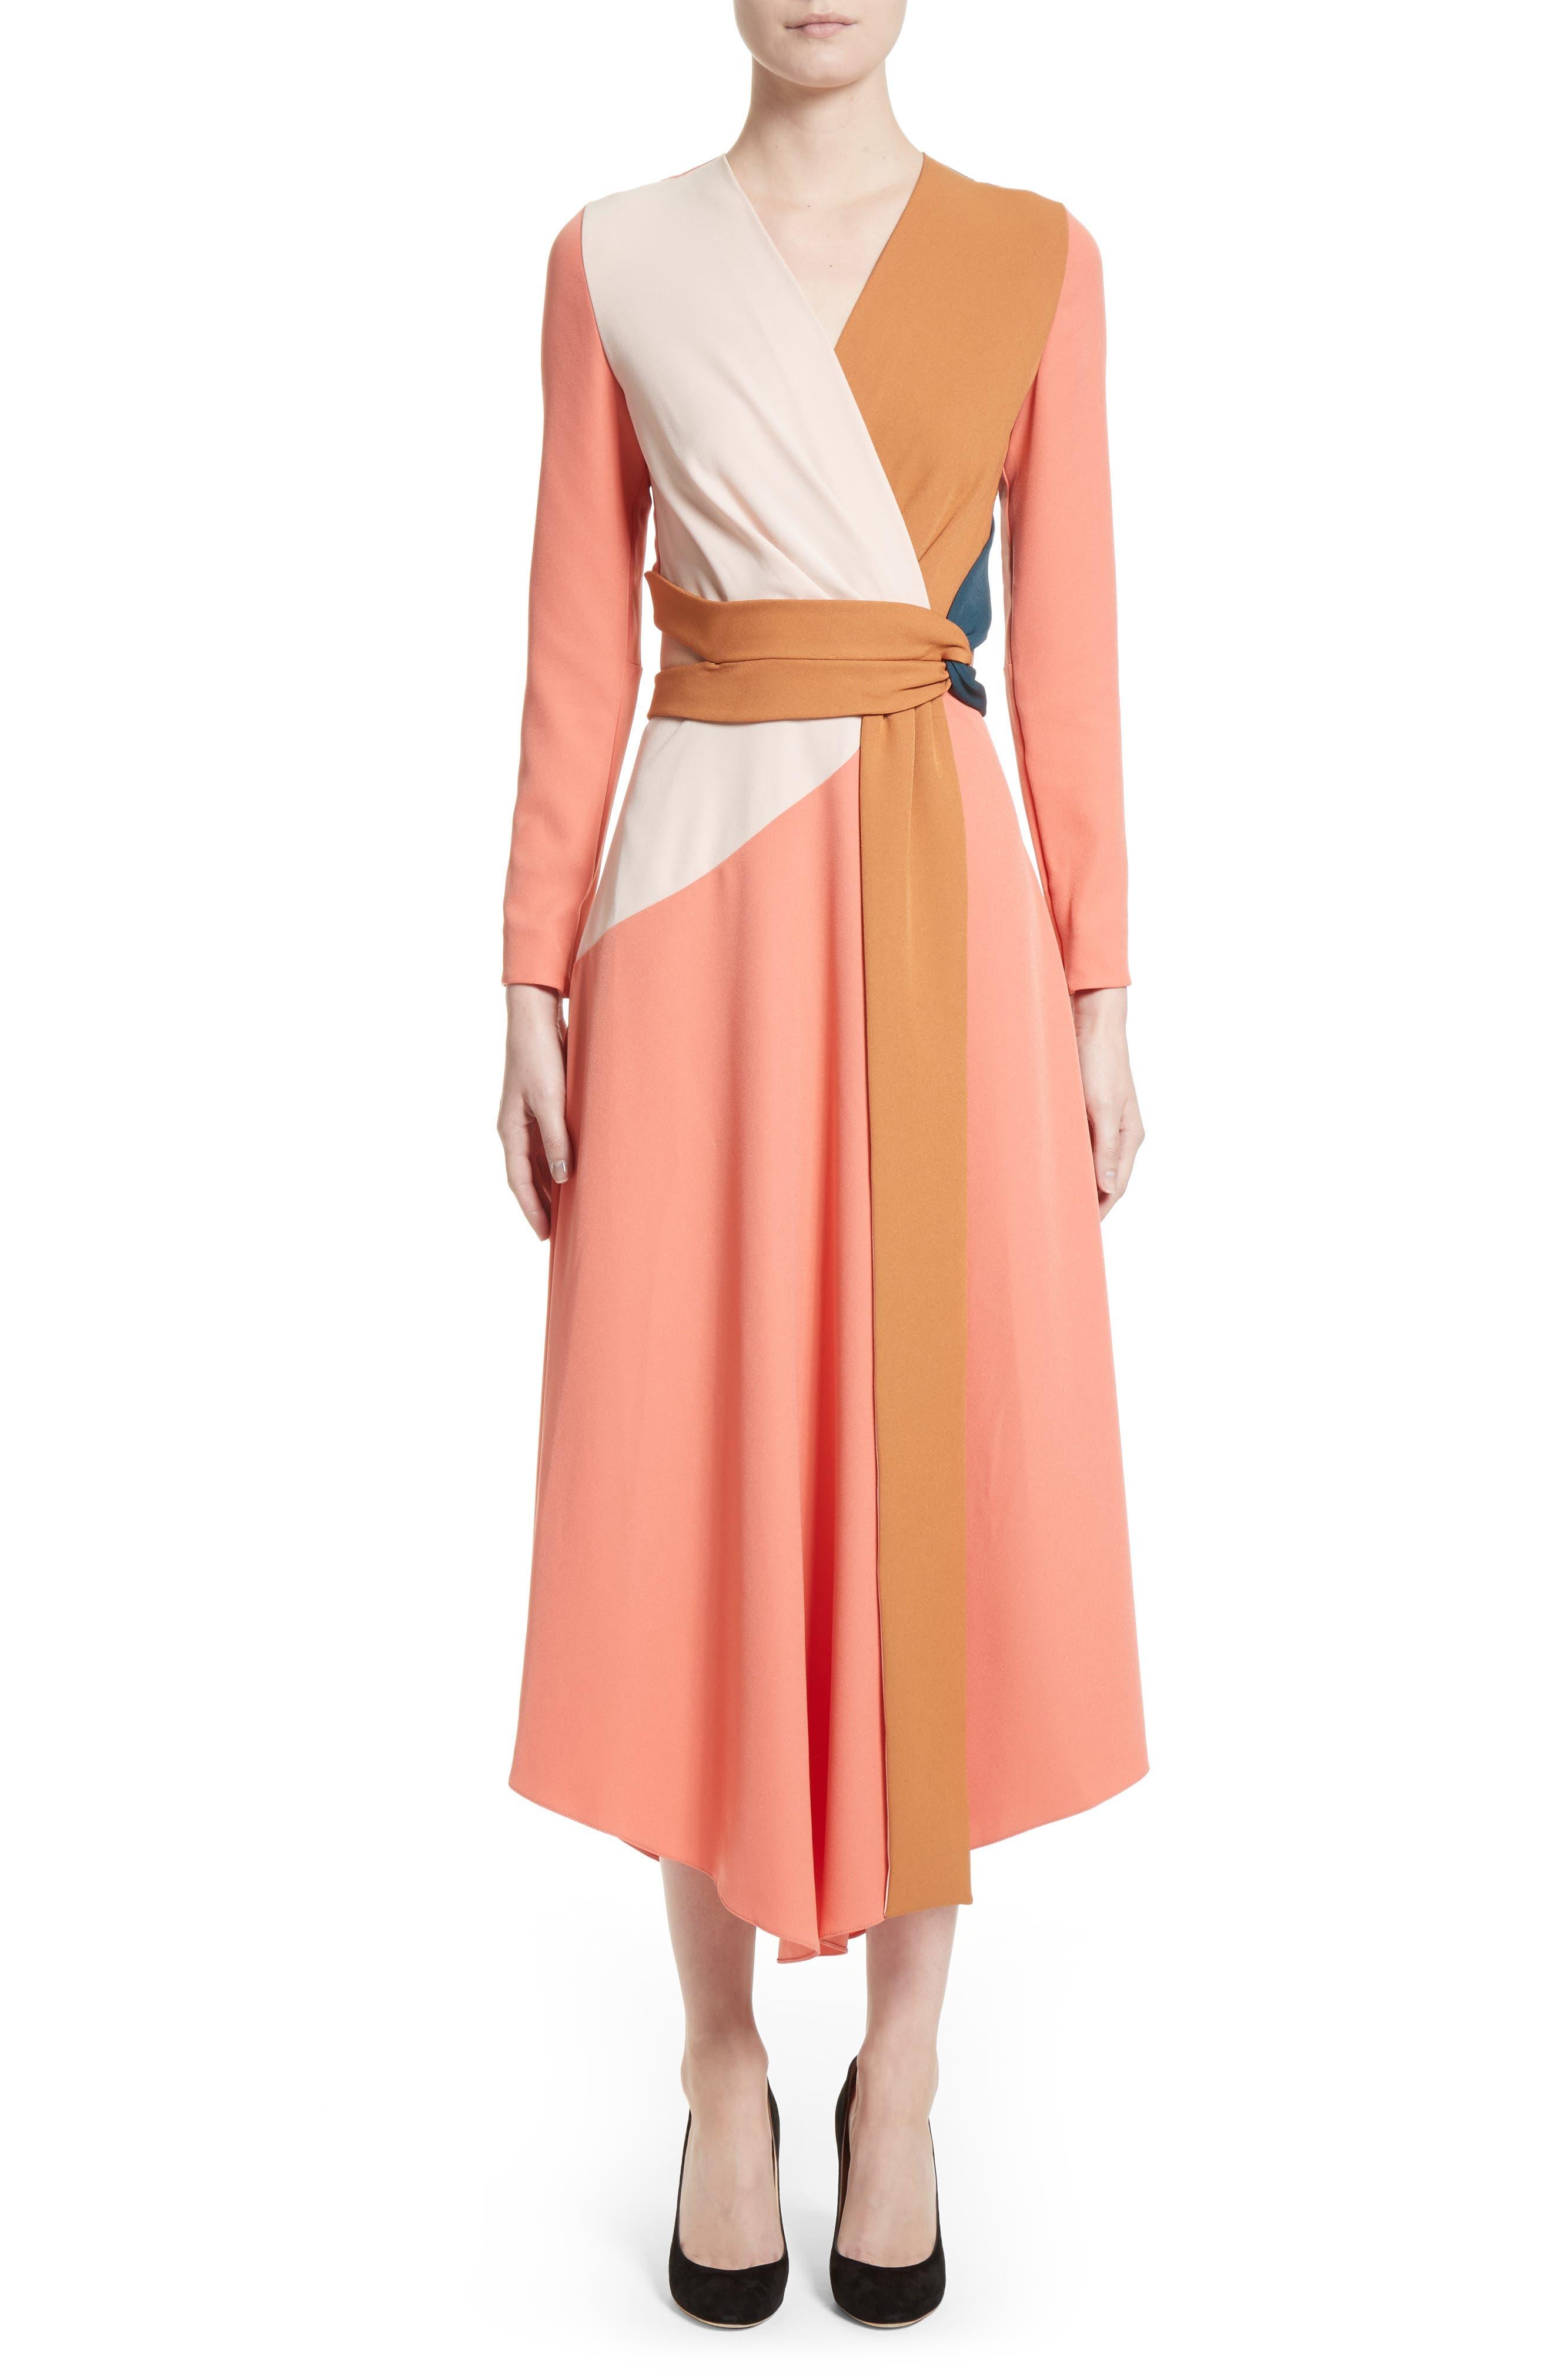 Himera Wrap Dress,                             Main thumbnail 1, color,                             950